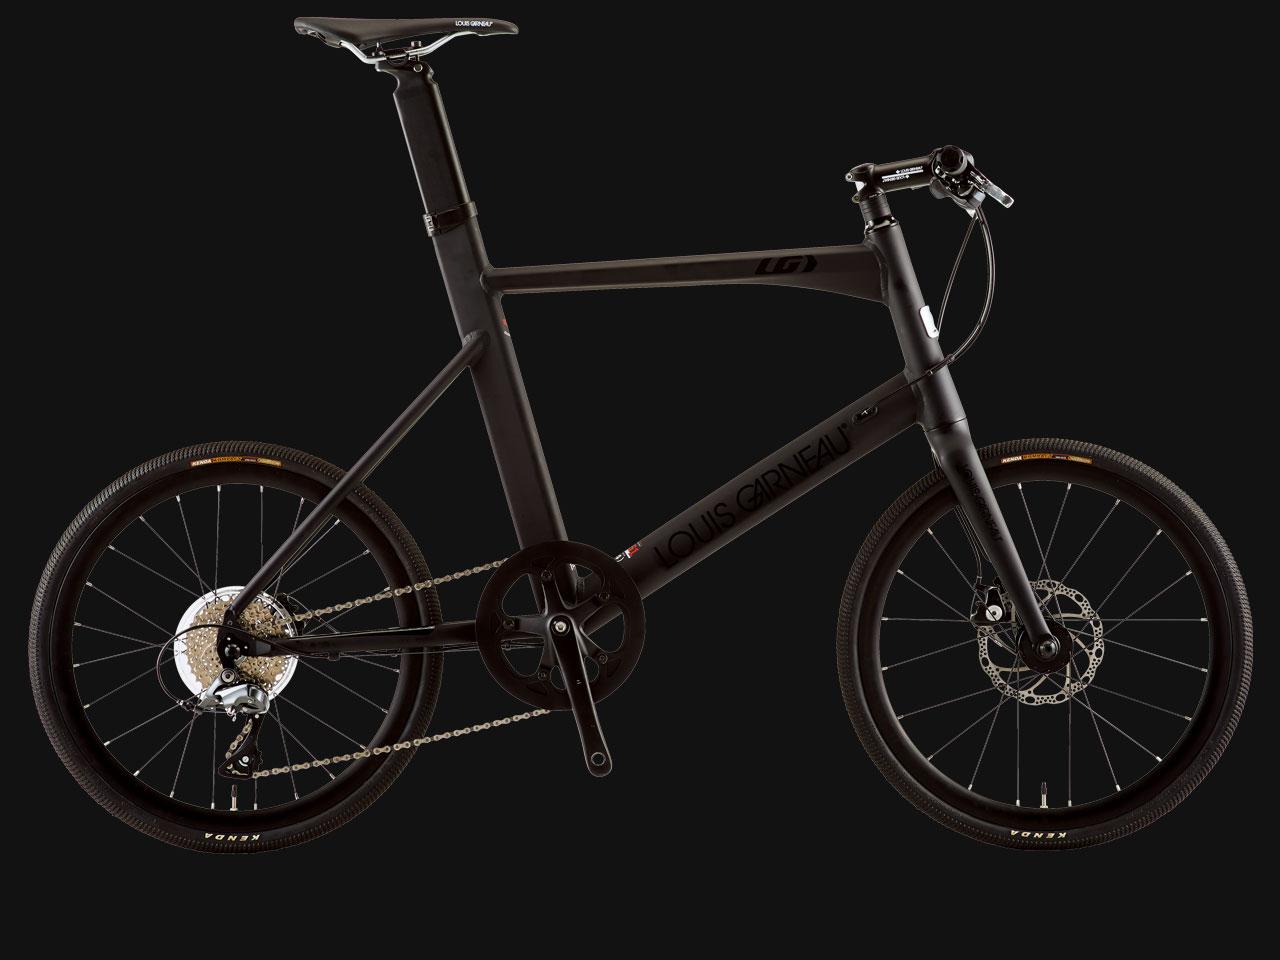 LOUIS GARNEAU ルイガノ EASEL ADVANED 3 MATTE LG BLACK 小径自転車 ミニベロ